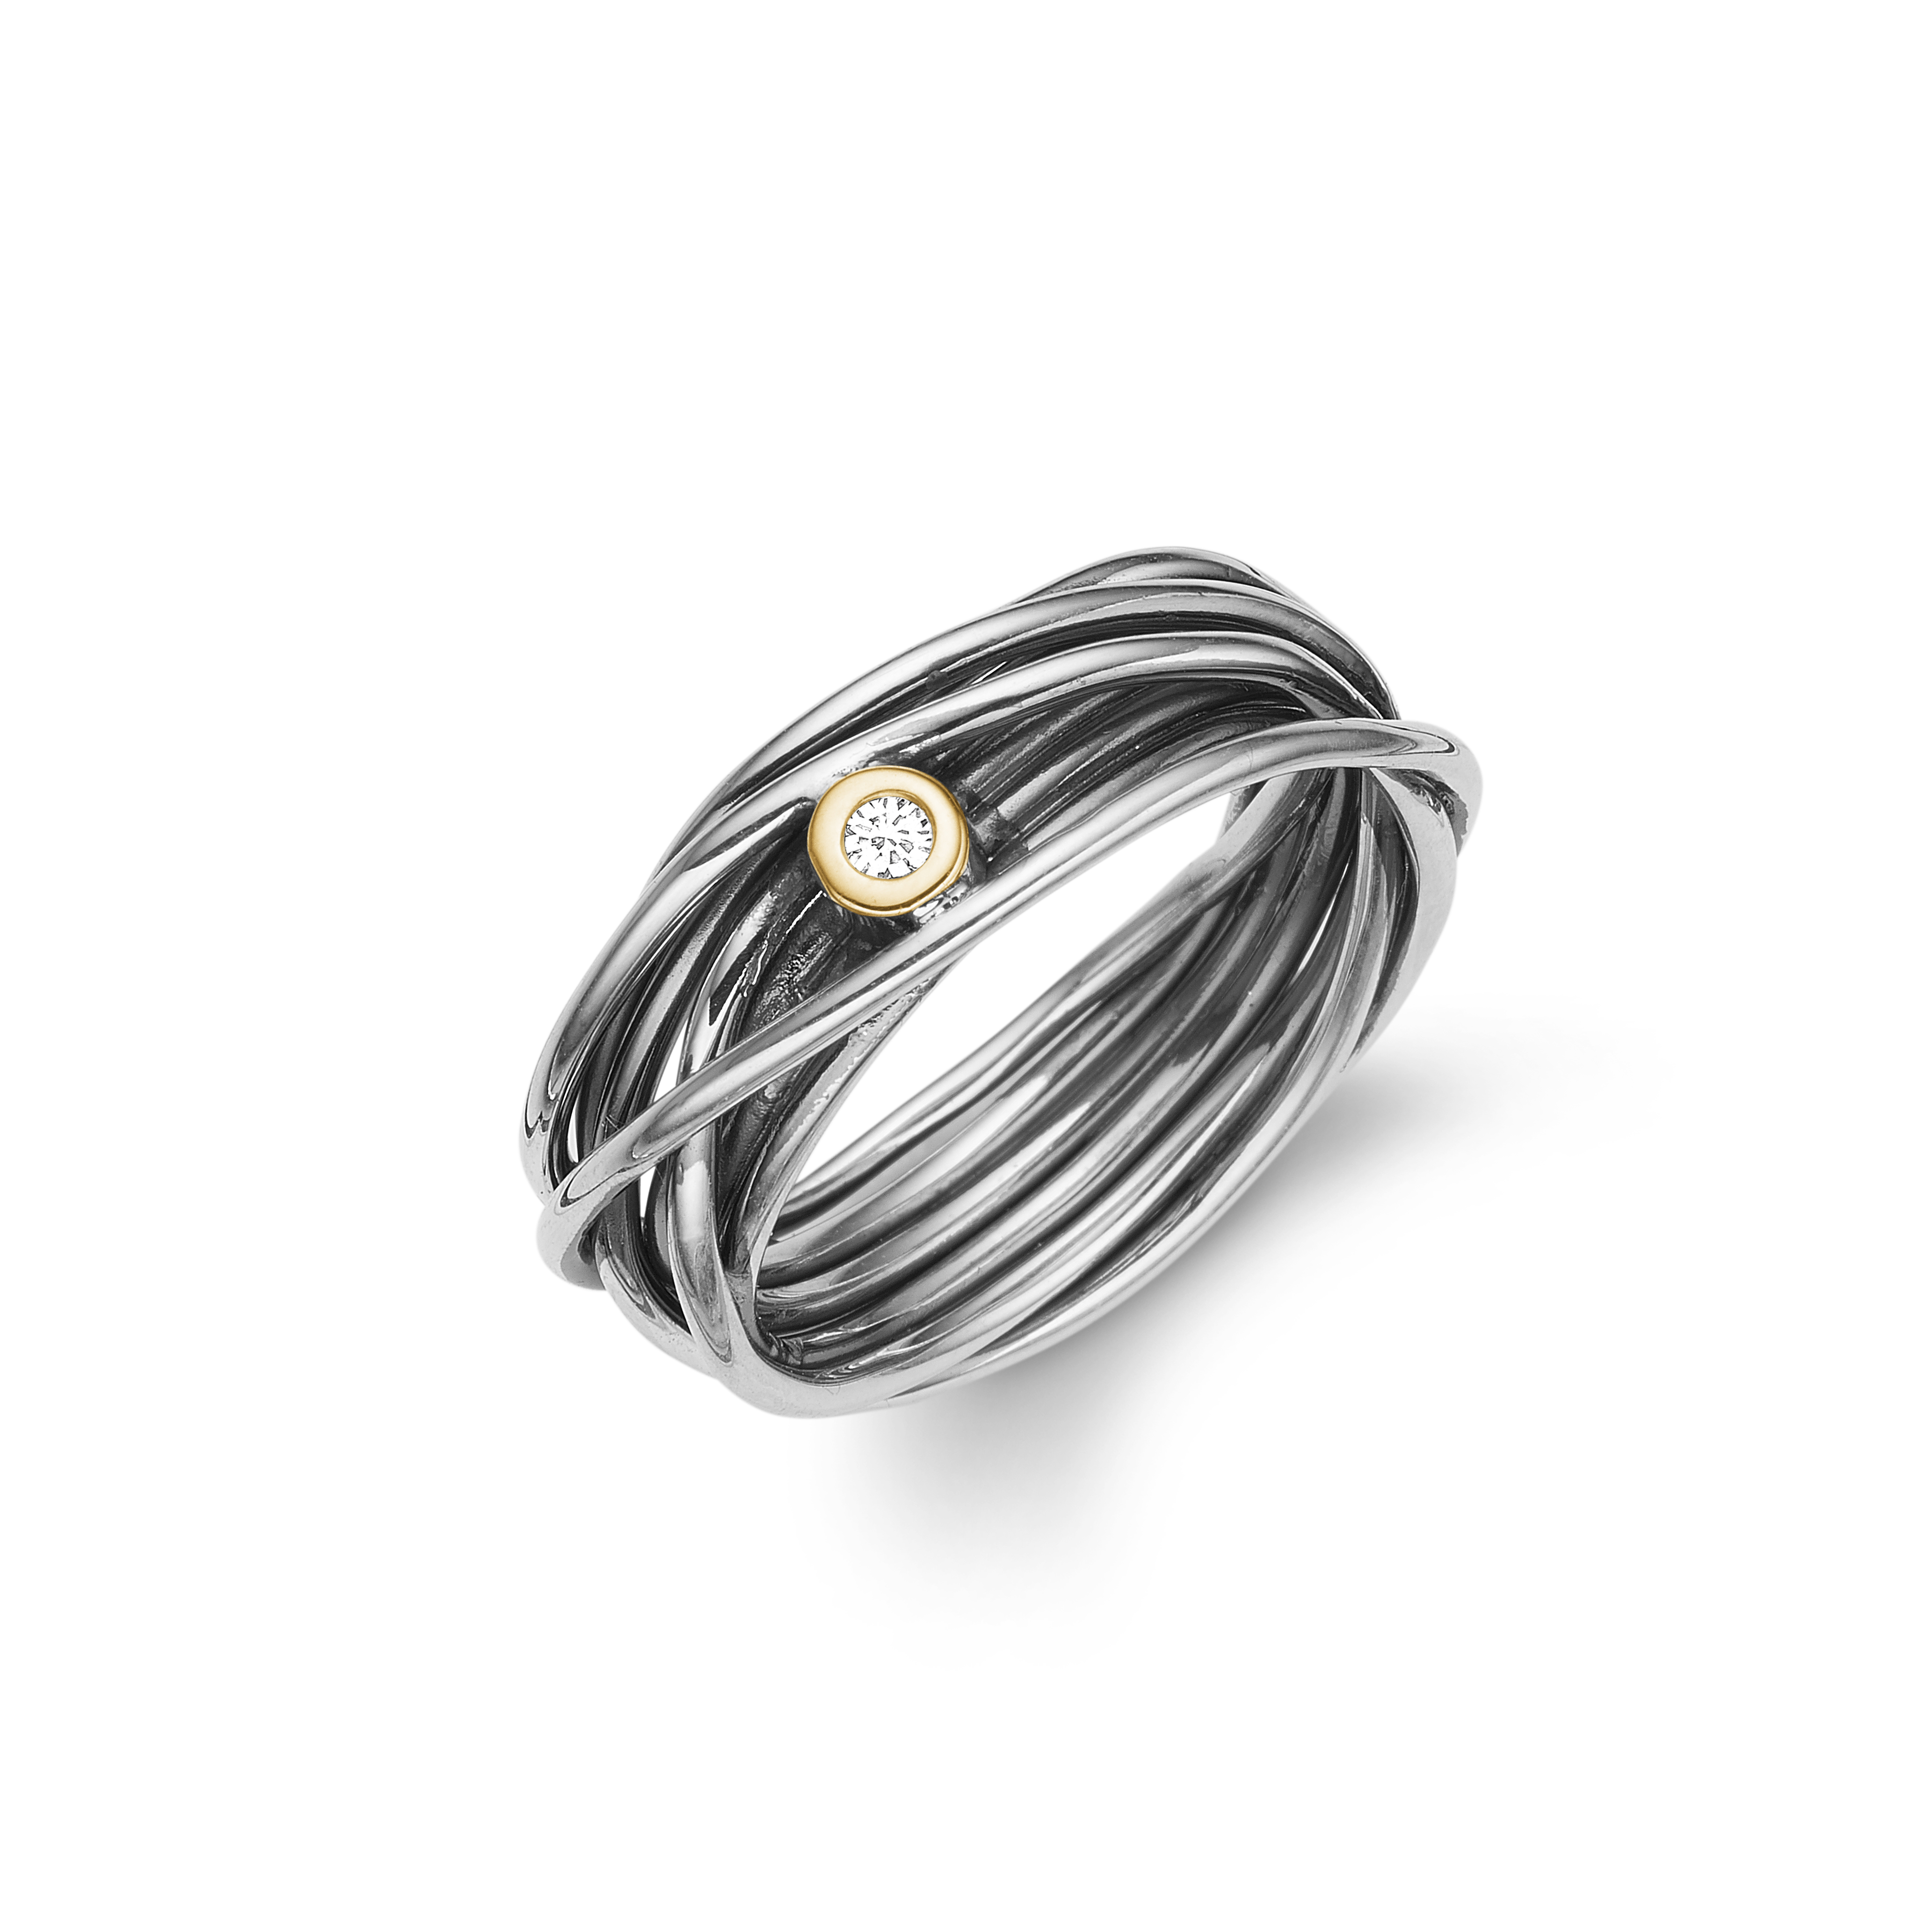 Image of   Aagaard Sølv ring - 11641528-34 Størrelse 58